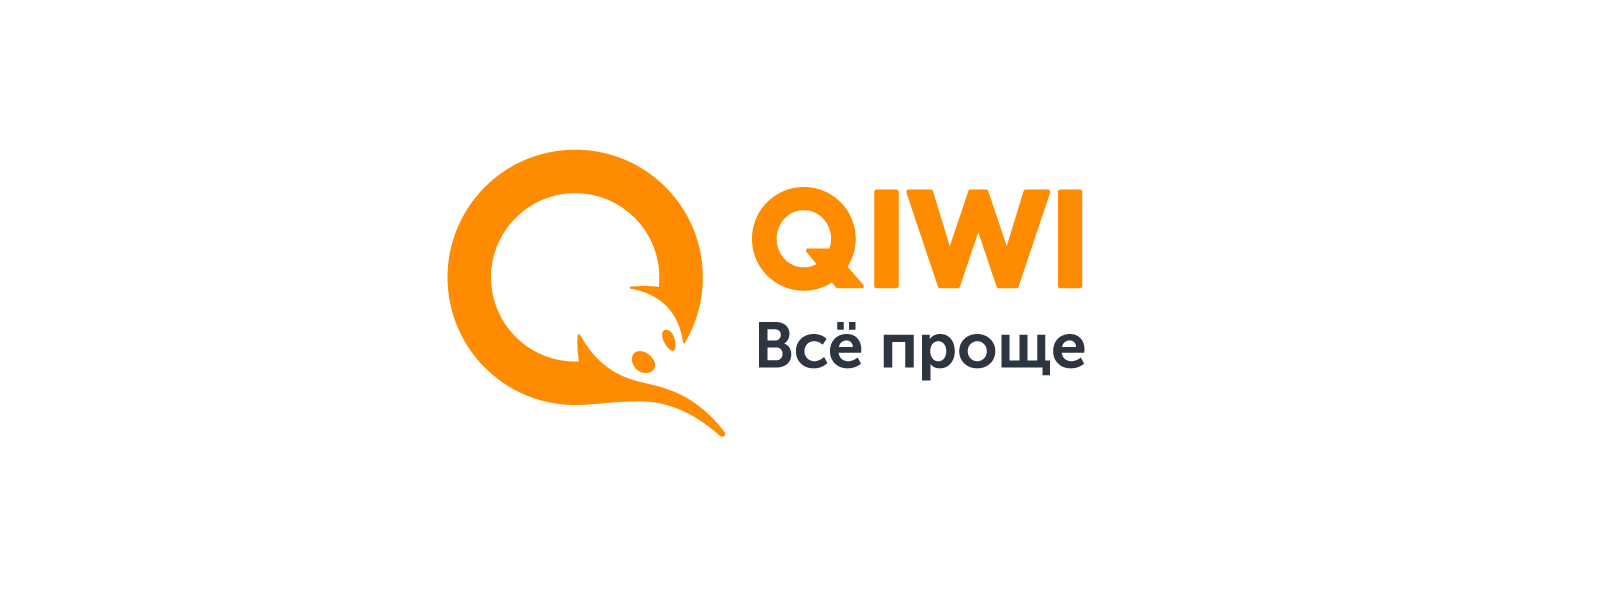 QIWI поддержала «ЦИФРОВЫЕ ВОРОТНИЧКИ»